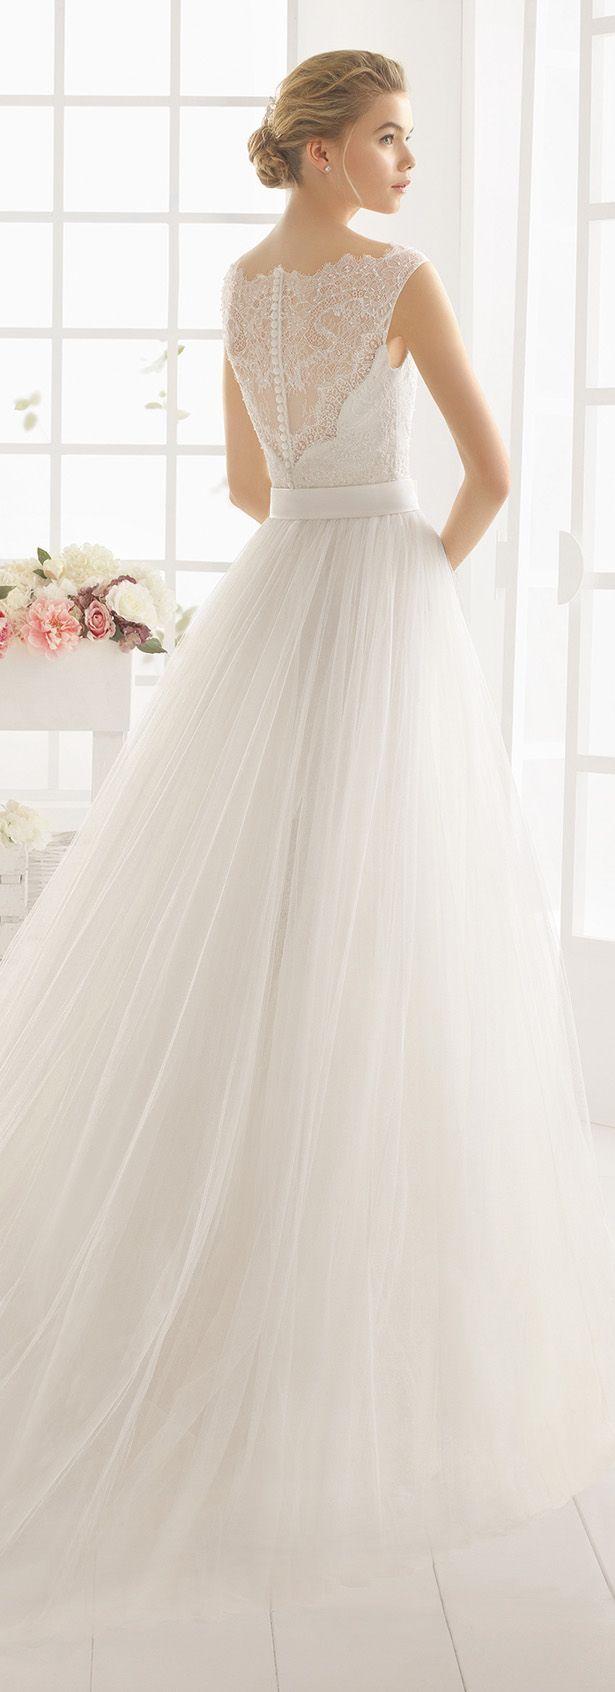 Wedding dress runaway bride   best The Princess  Parlor images on Pinterest  Bridal